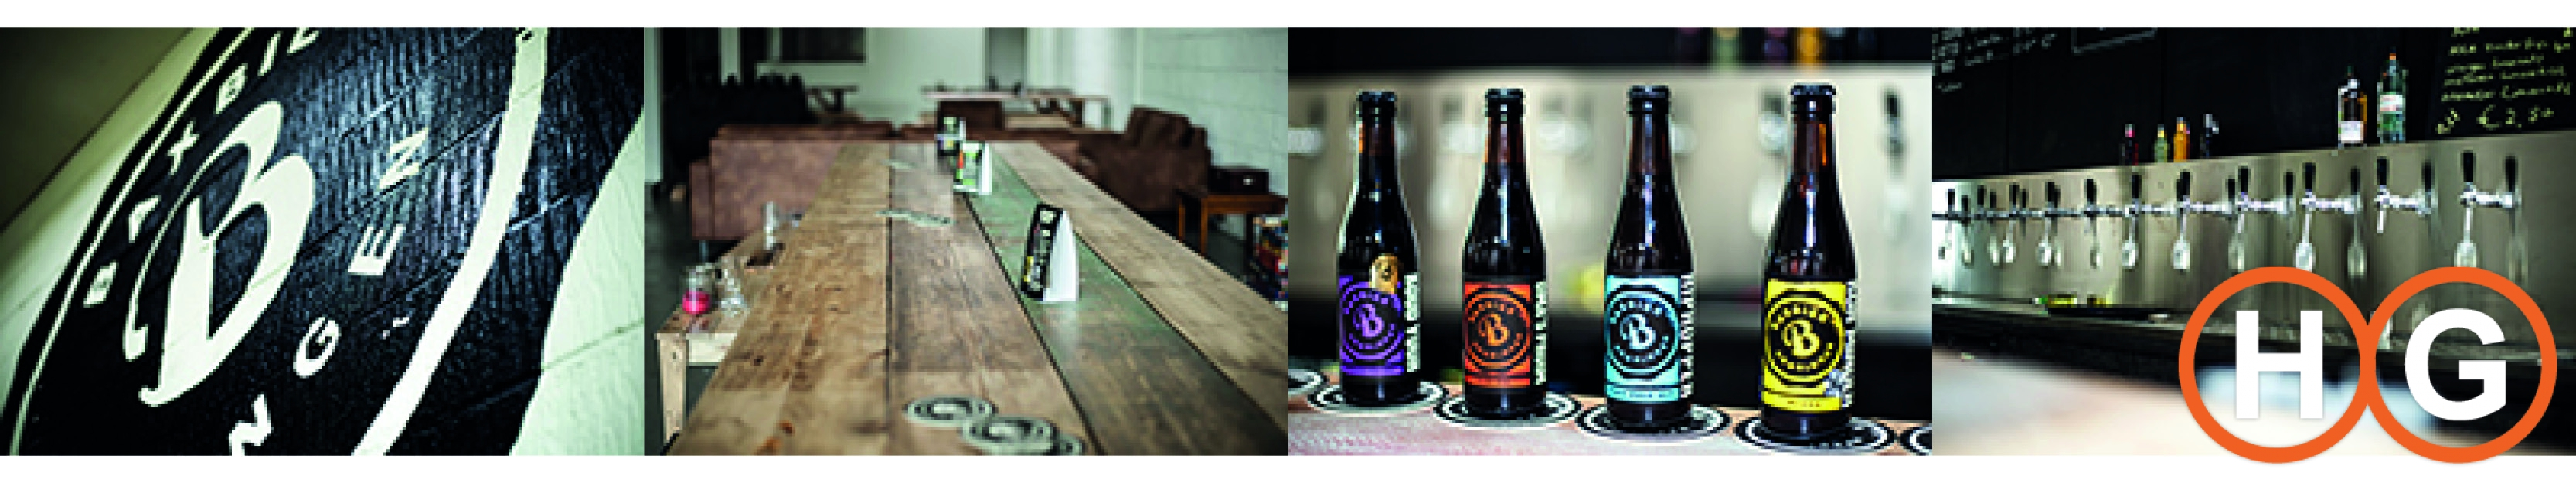 Bax bier proeflokaal brouwerij collage